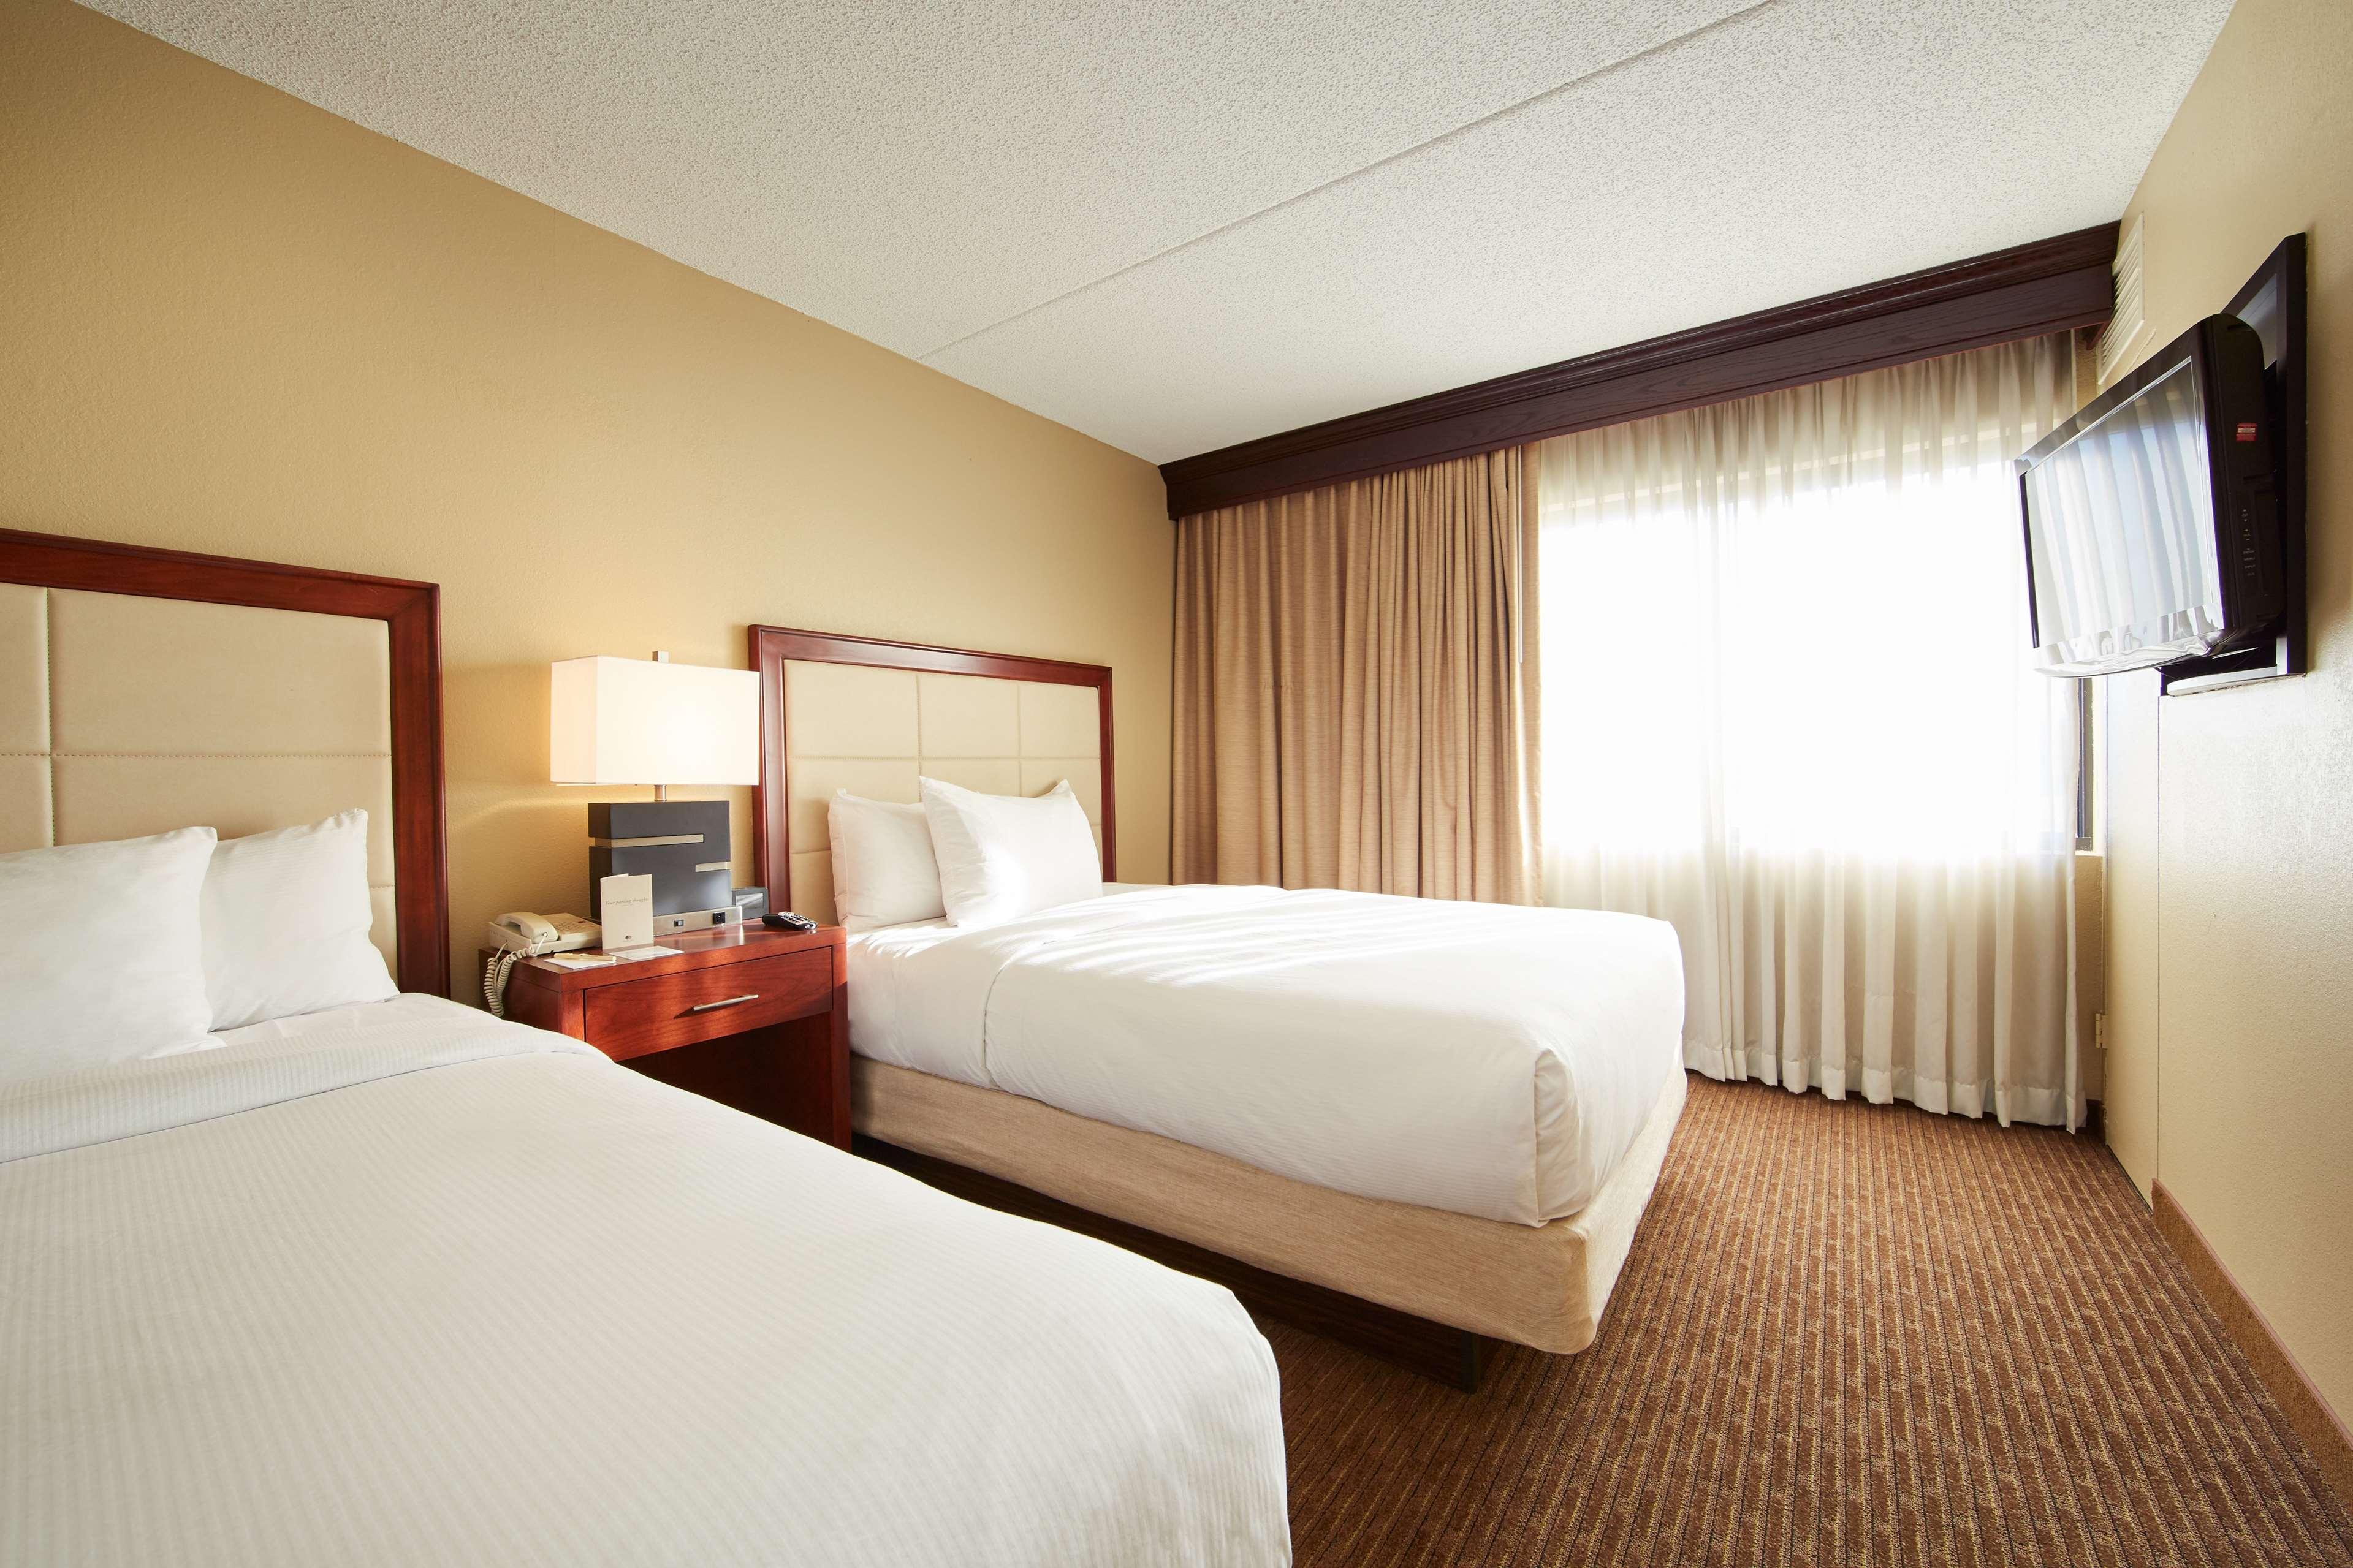 DoubleTree Suites by Hilton Hotel Cincinnati - Blue Ash image 12